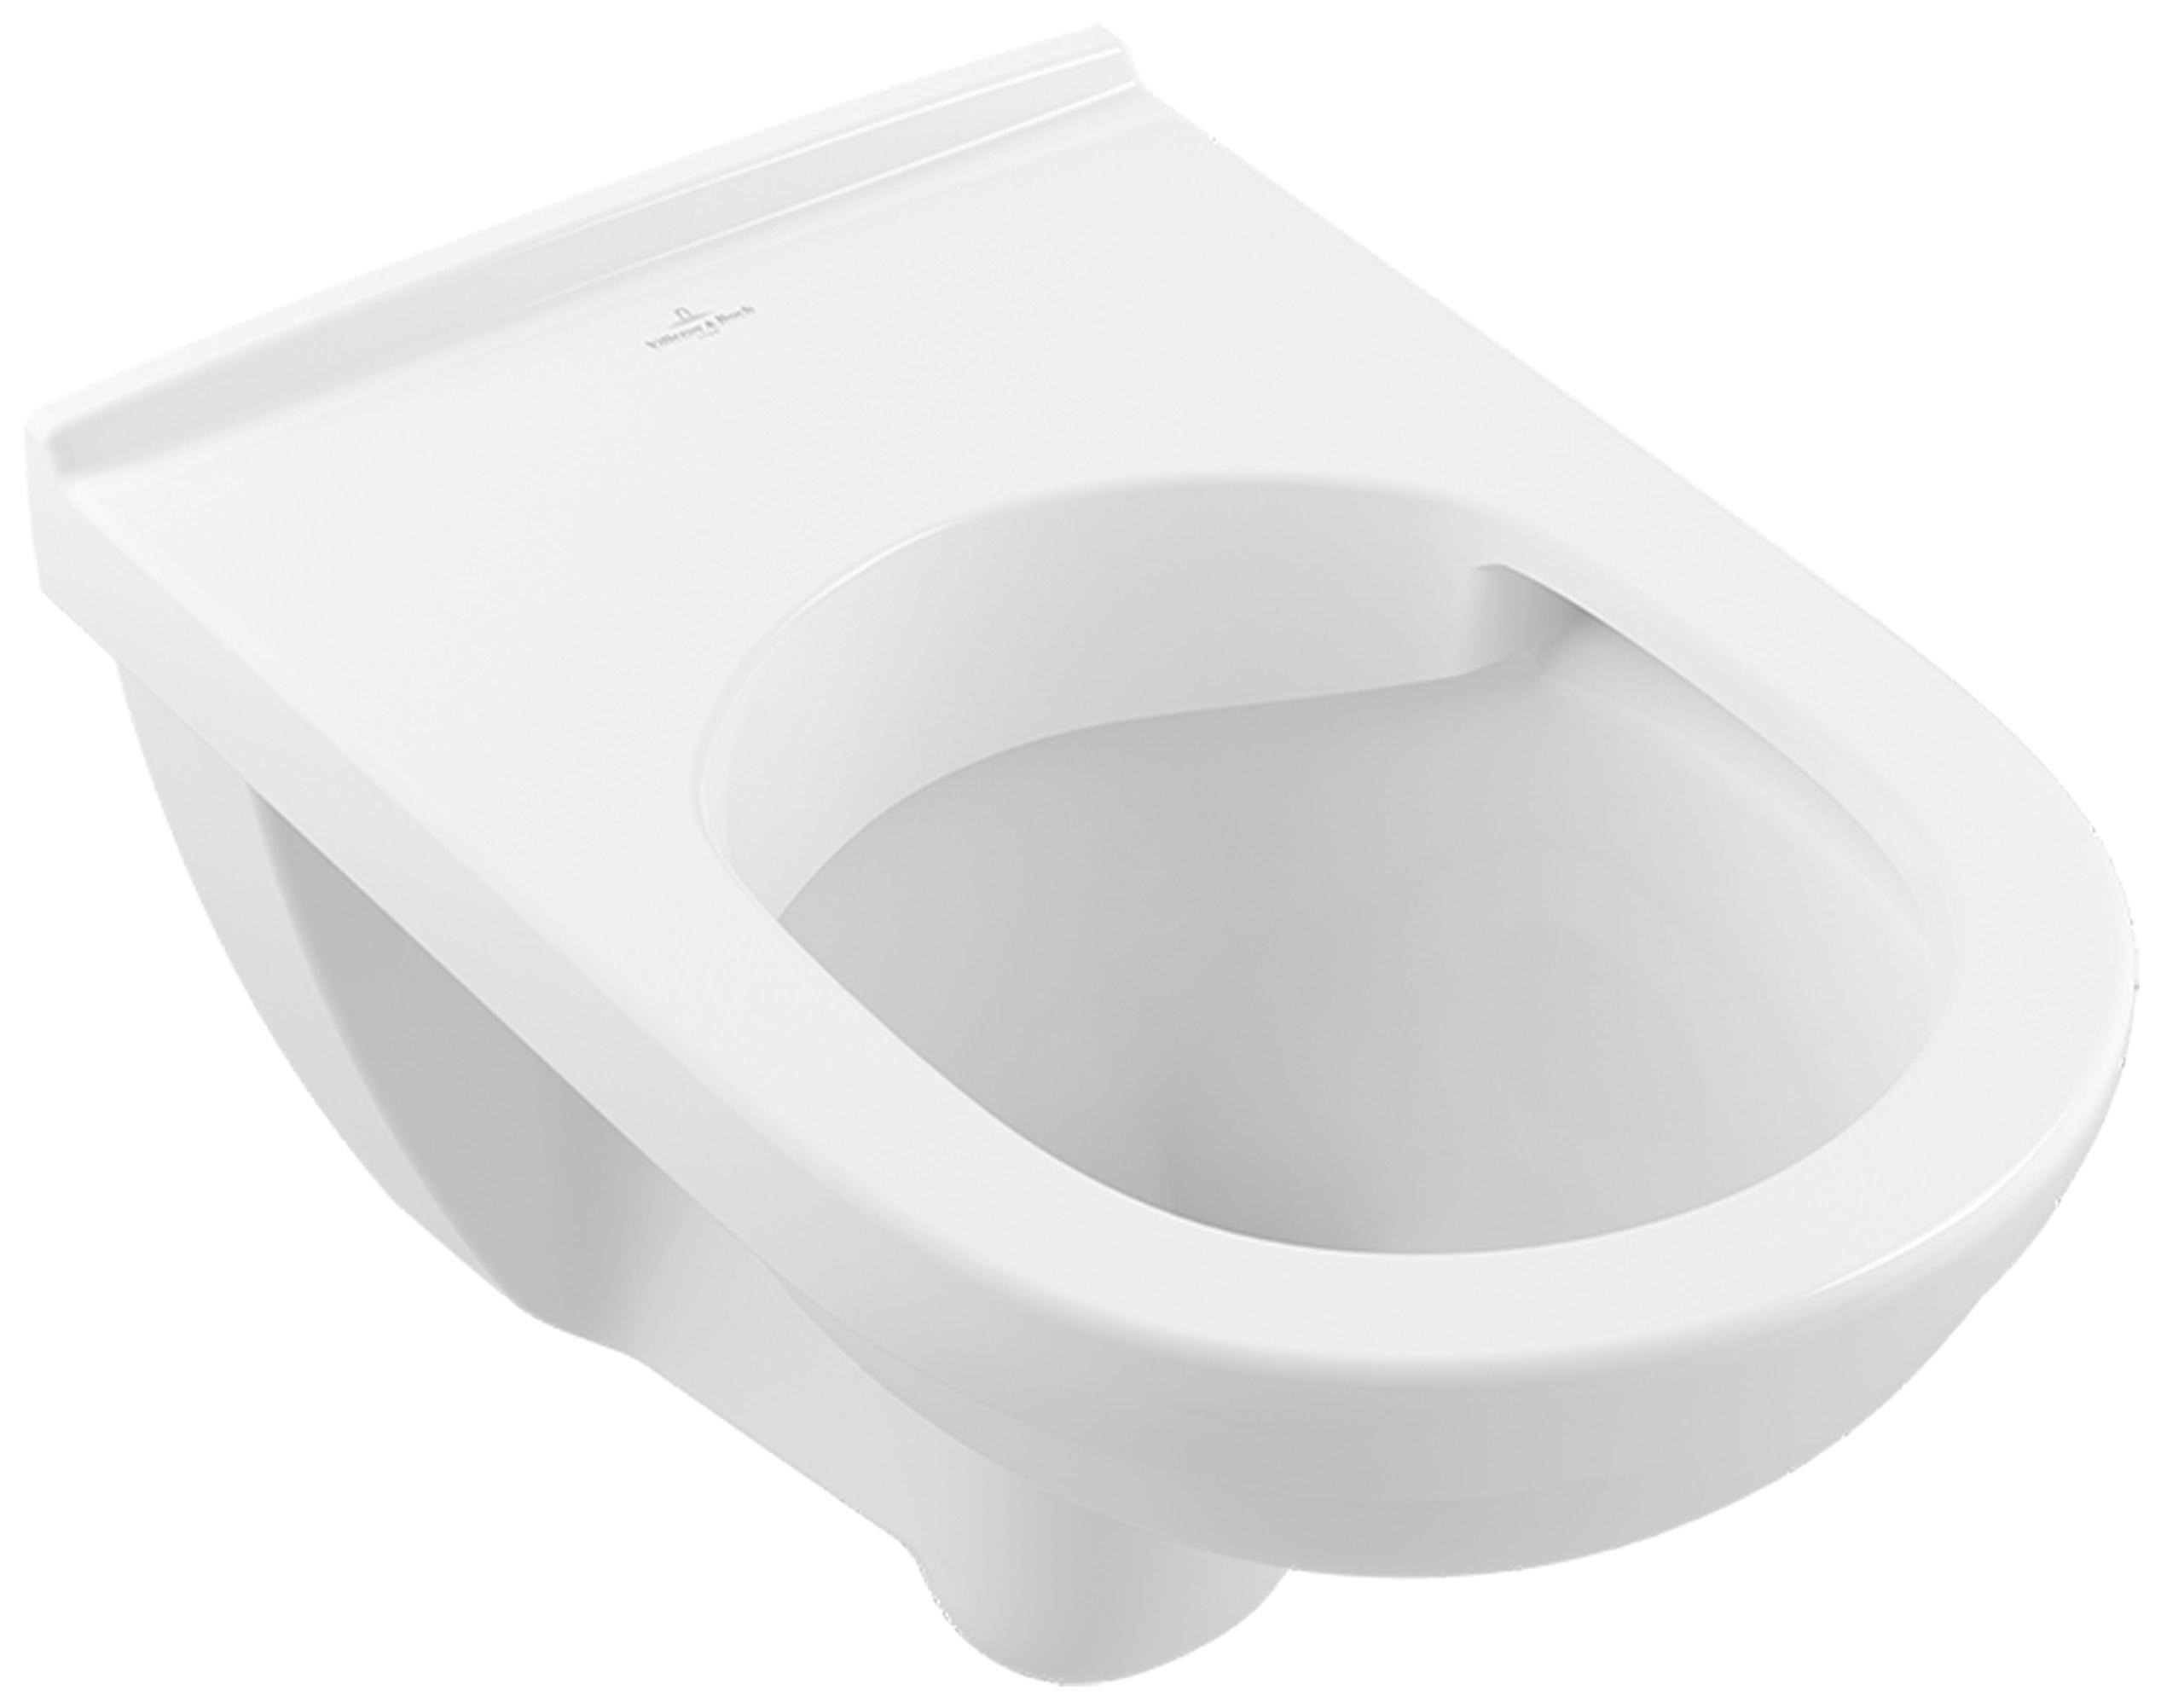 villeroy boch o novo tiefsp lklosett wand wc ohne sp lrand ohne befestigungsl cher f r wc sitz. Black Bedroom Furniture Sets. Home Design Ideas